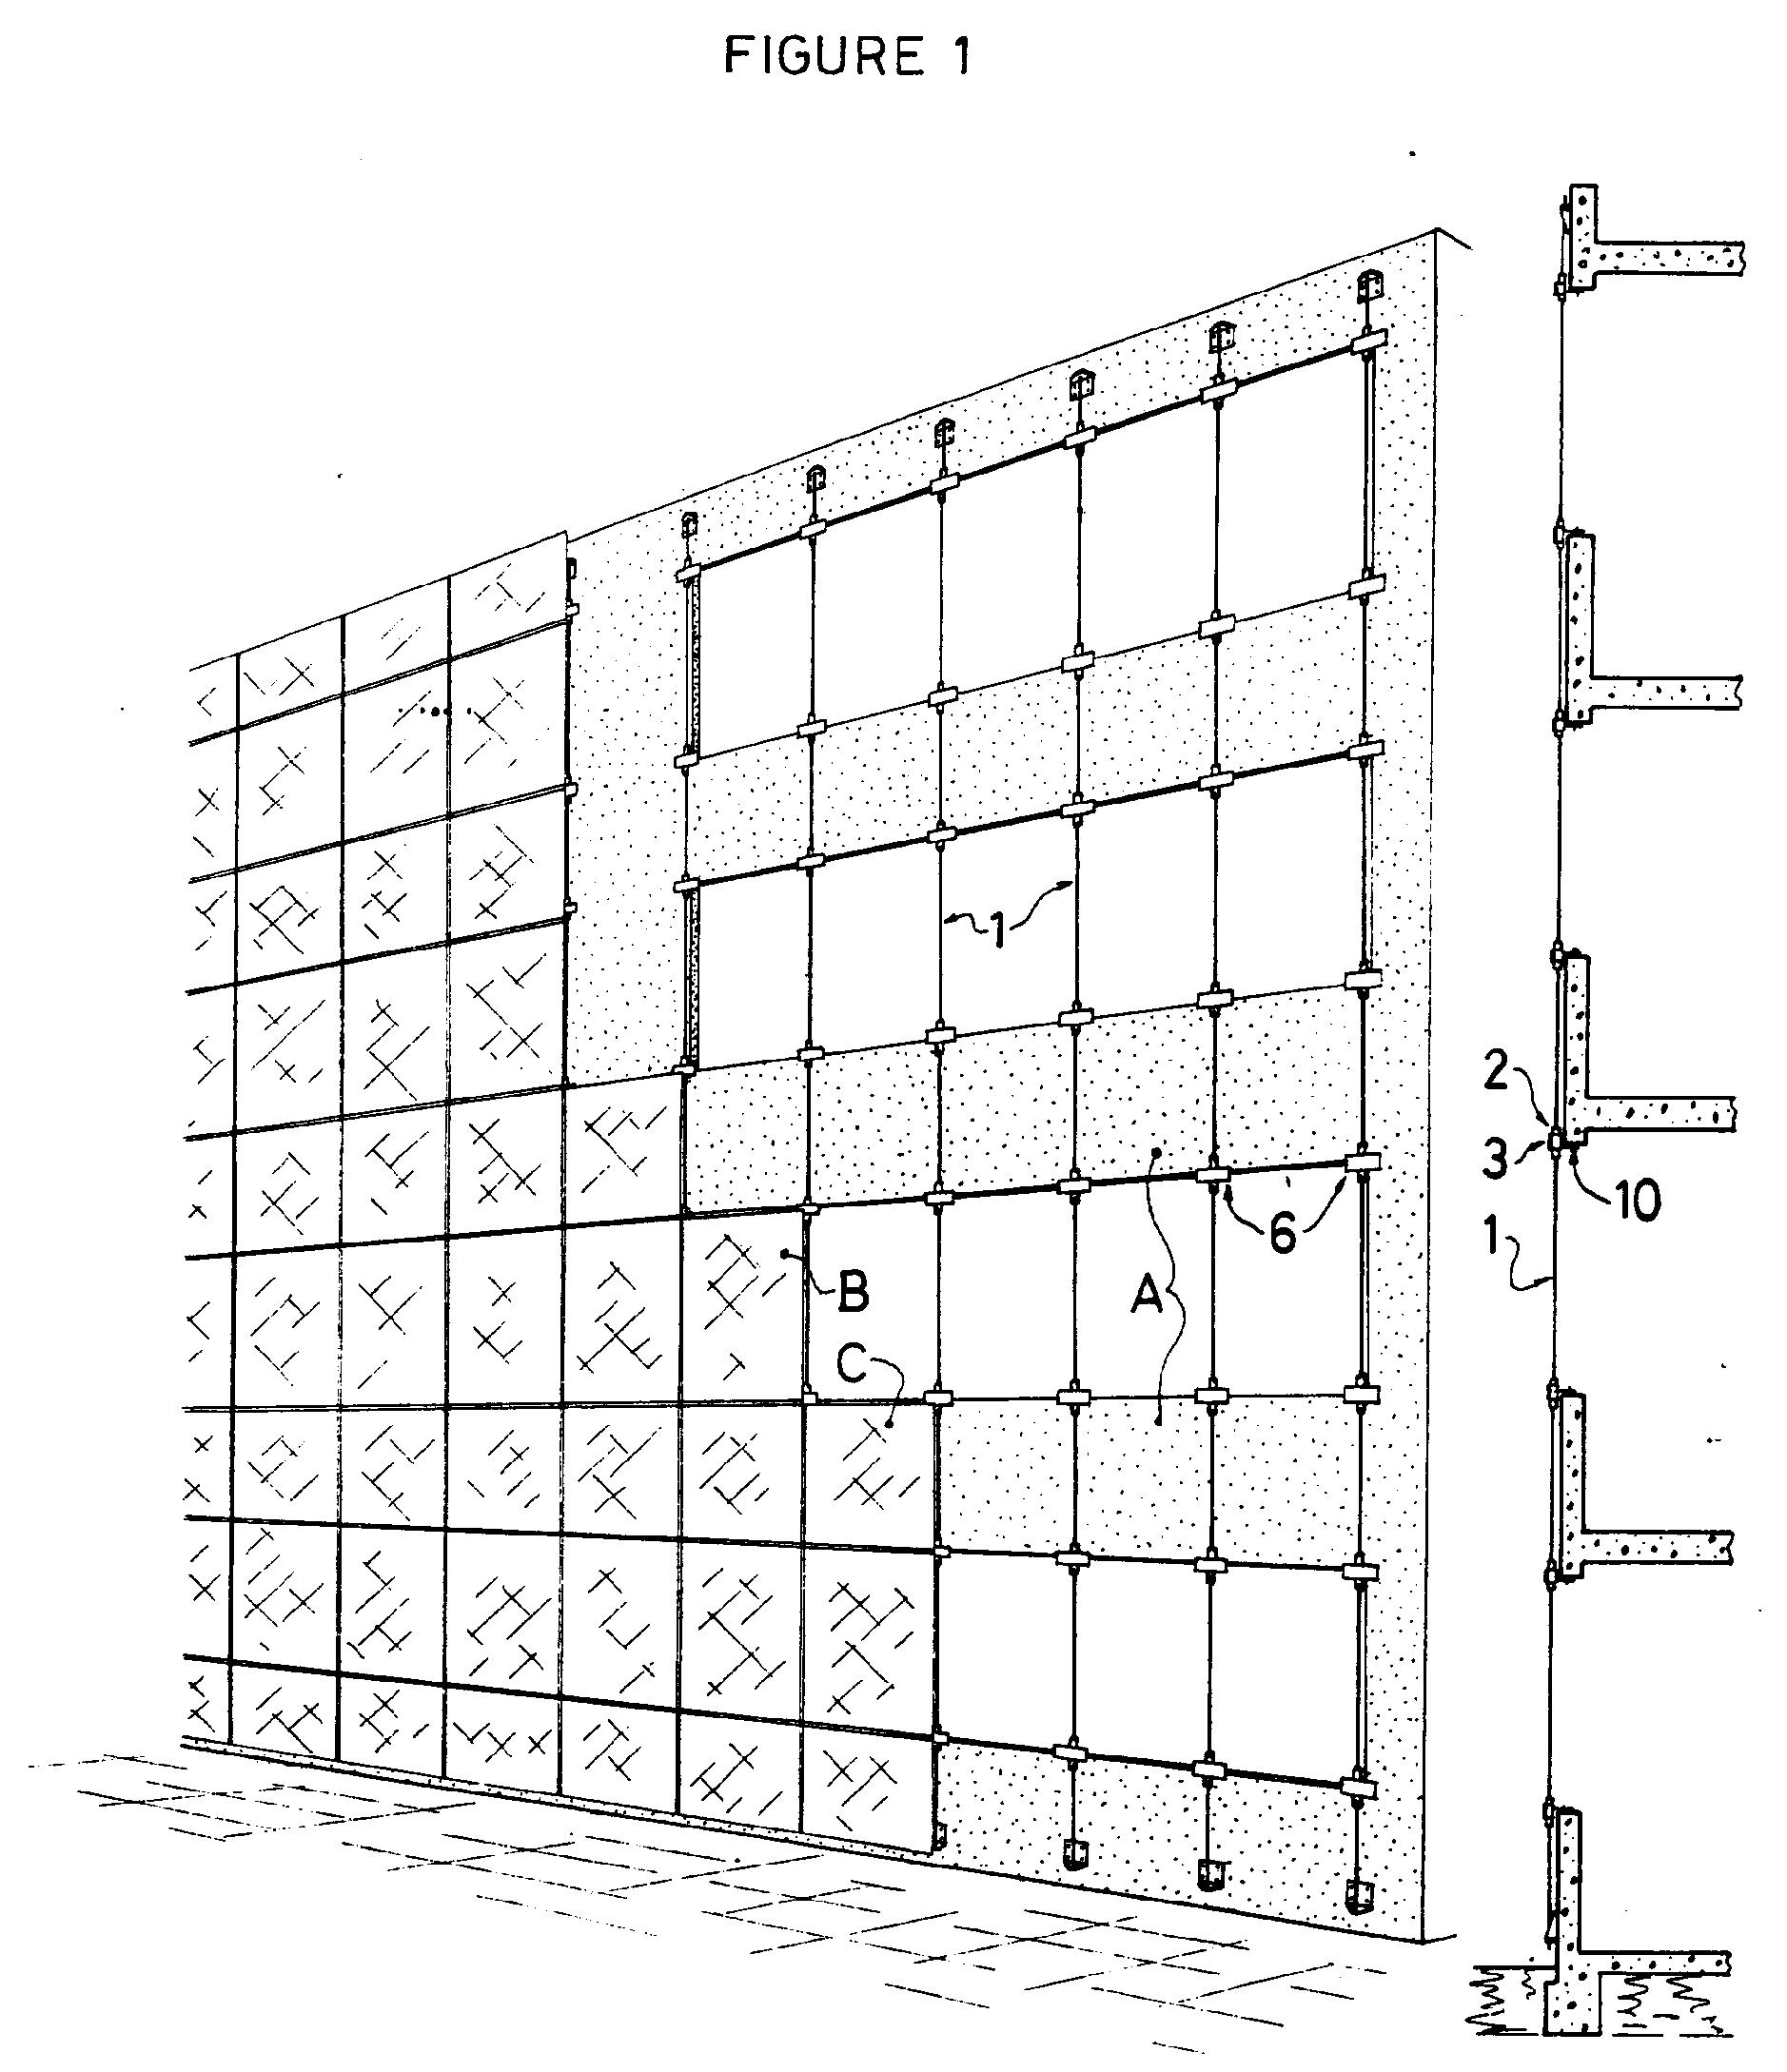 Different Type De Mur patent ep0387127b1 - structure de façade de type mur rideau à câbles